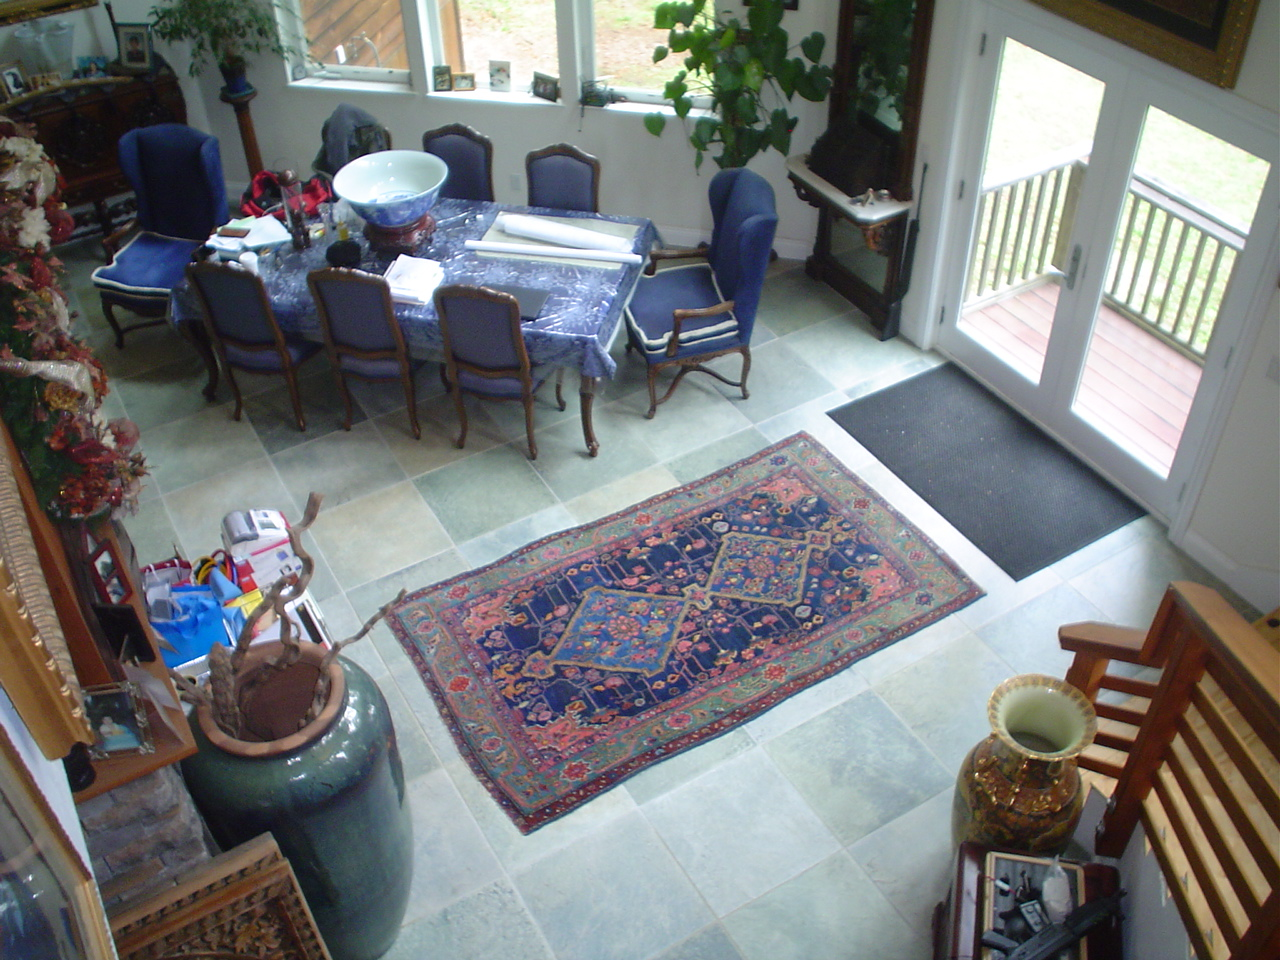 Beautiful antique Kurdish rug in client's home.